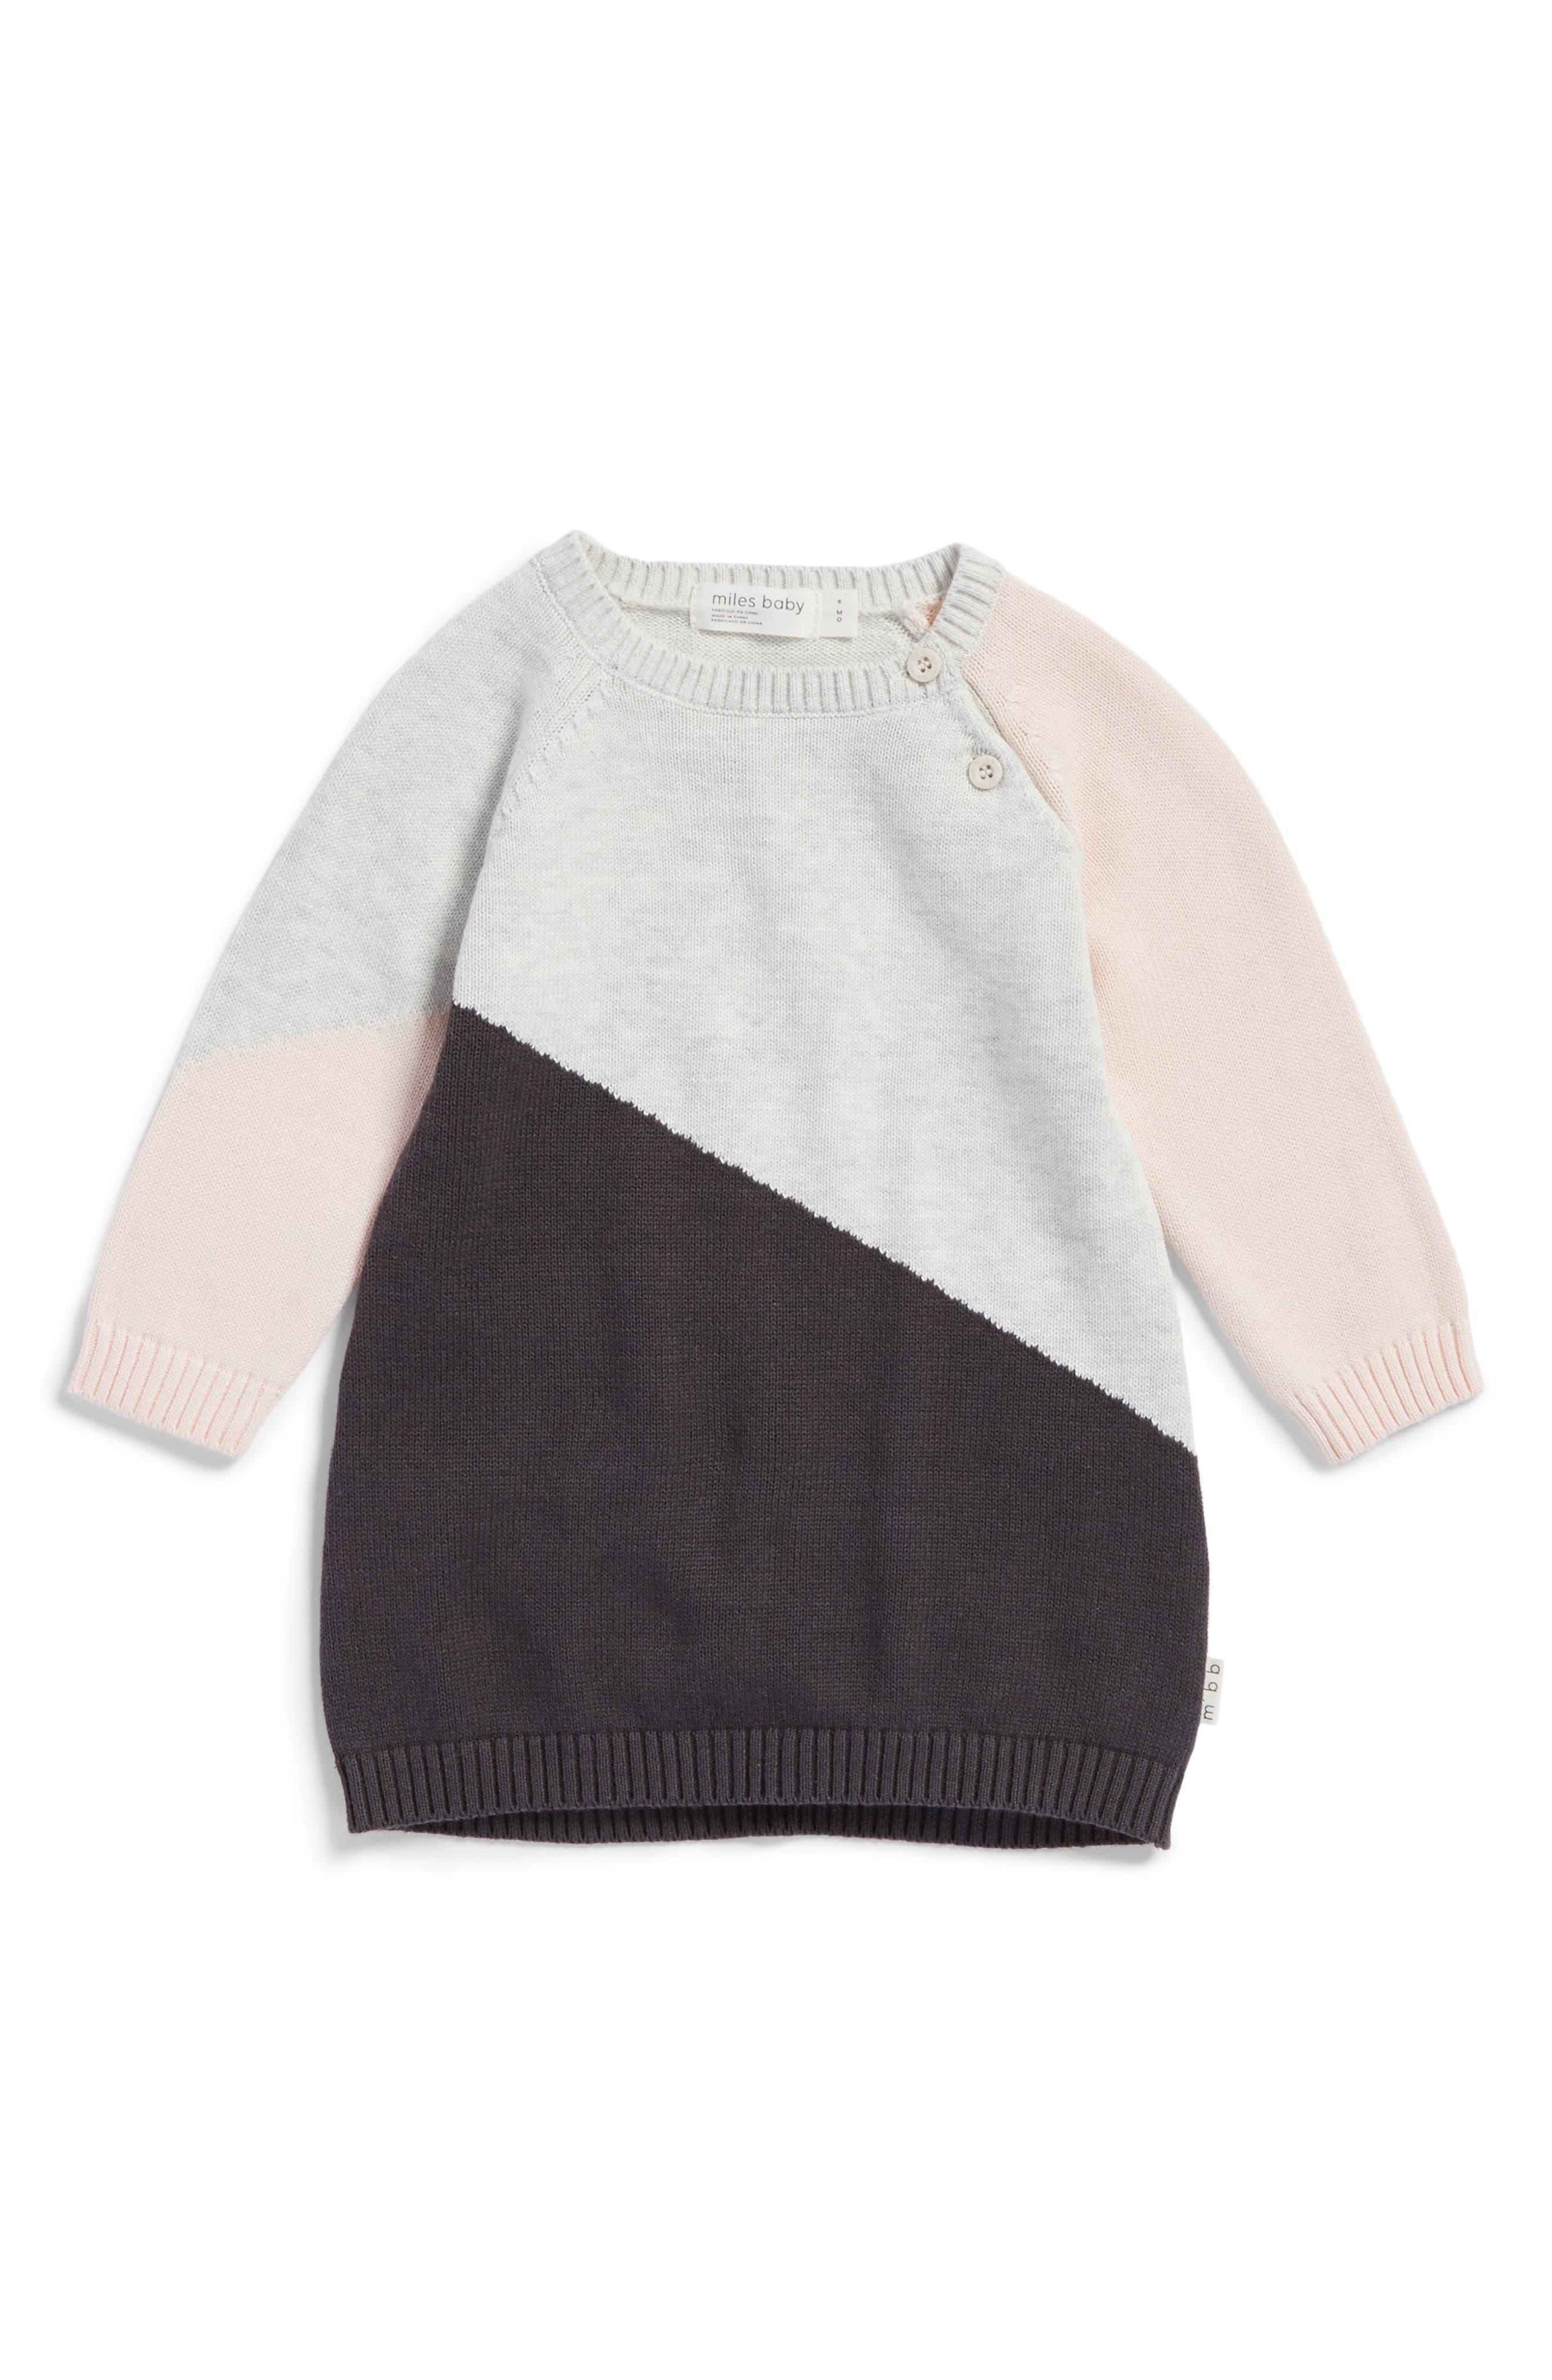 Main Image - Miles Baby Knit Sweater Dress (Baby Girls)